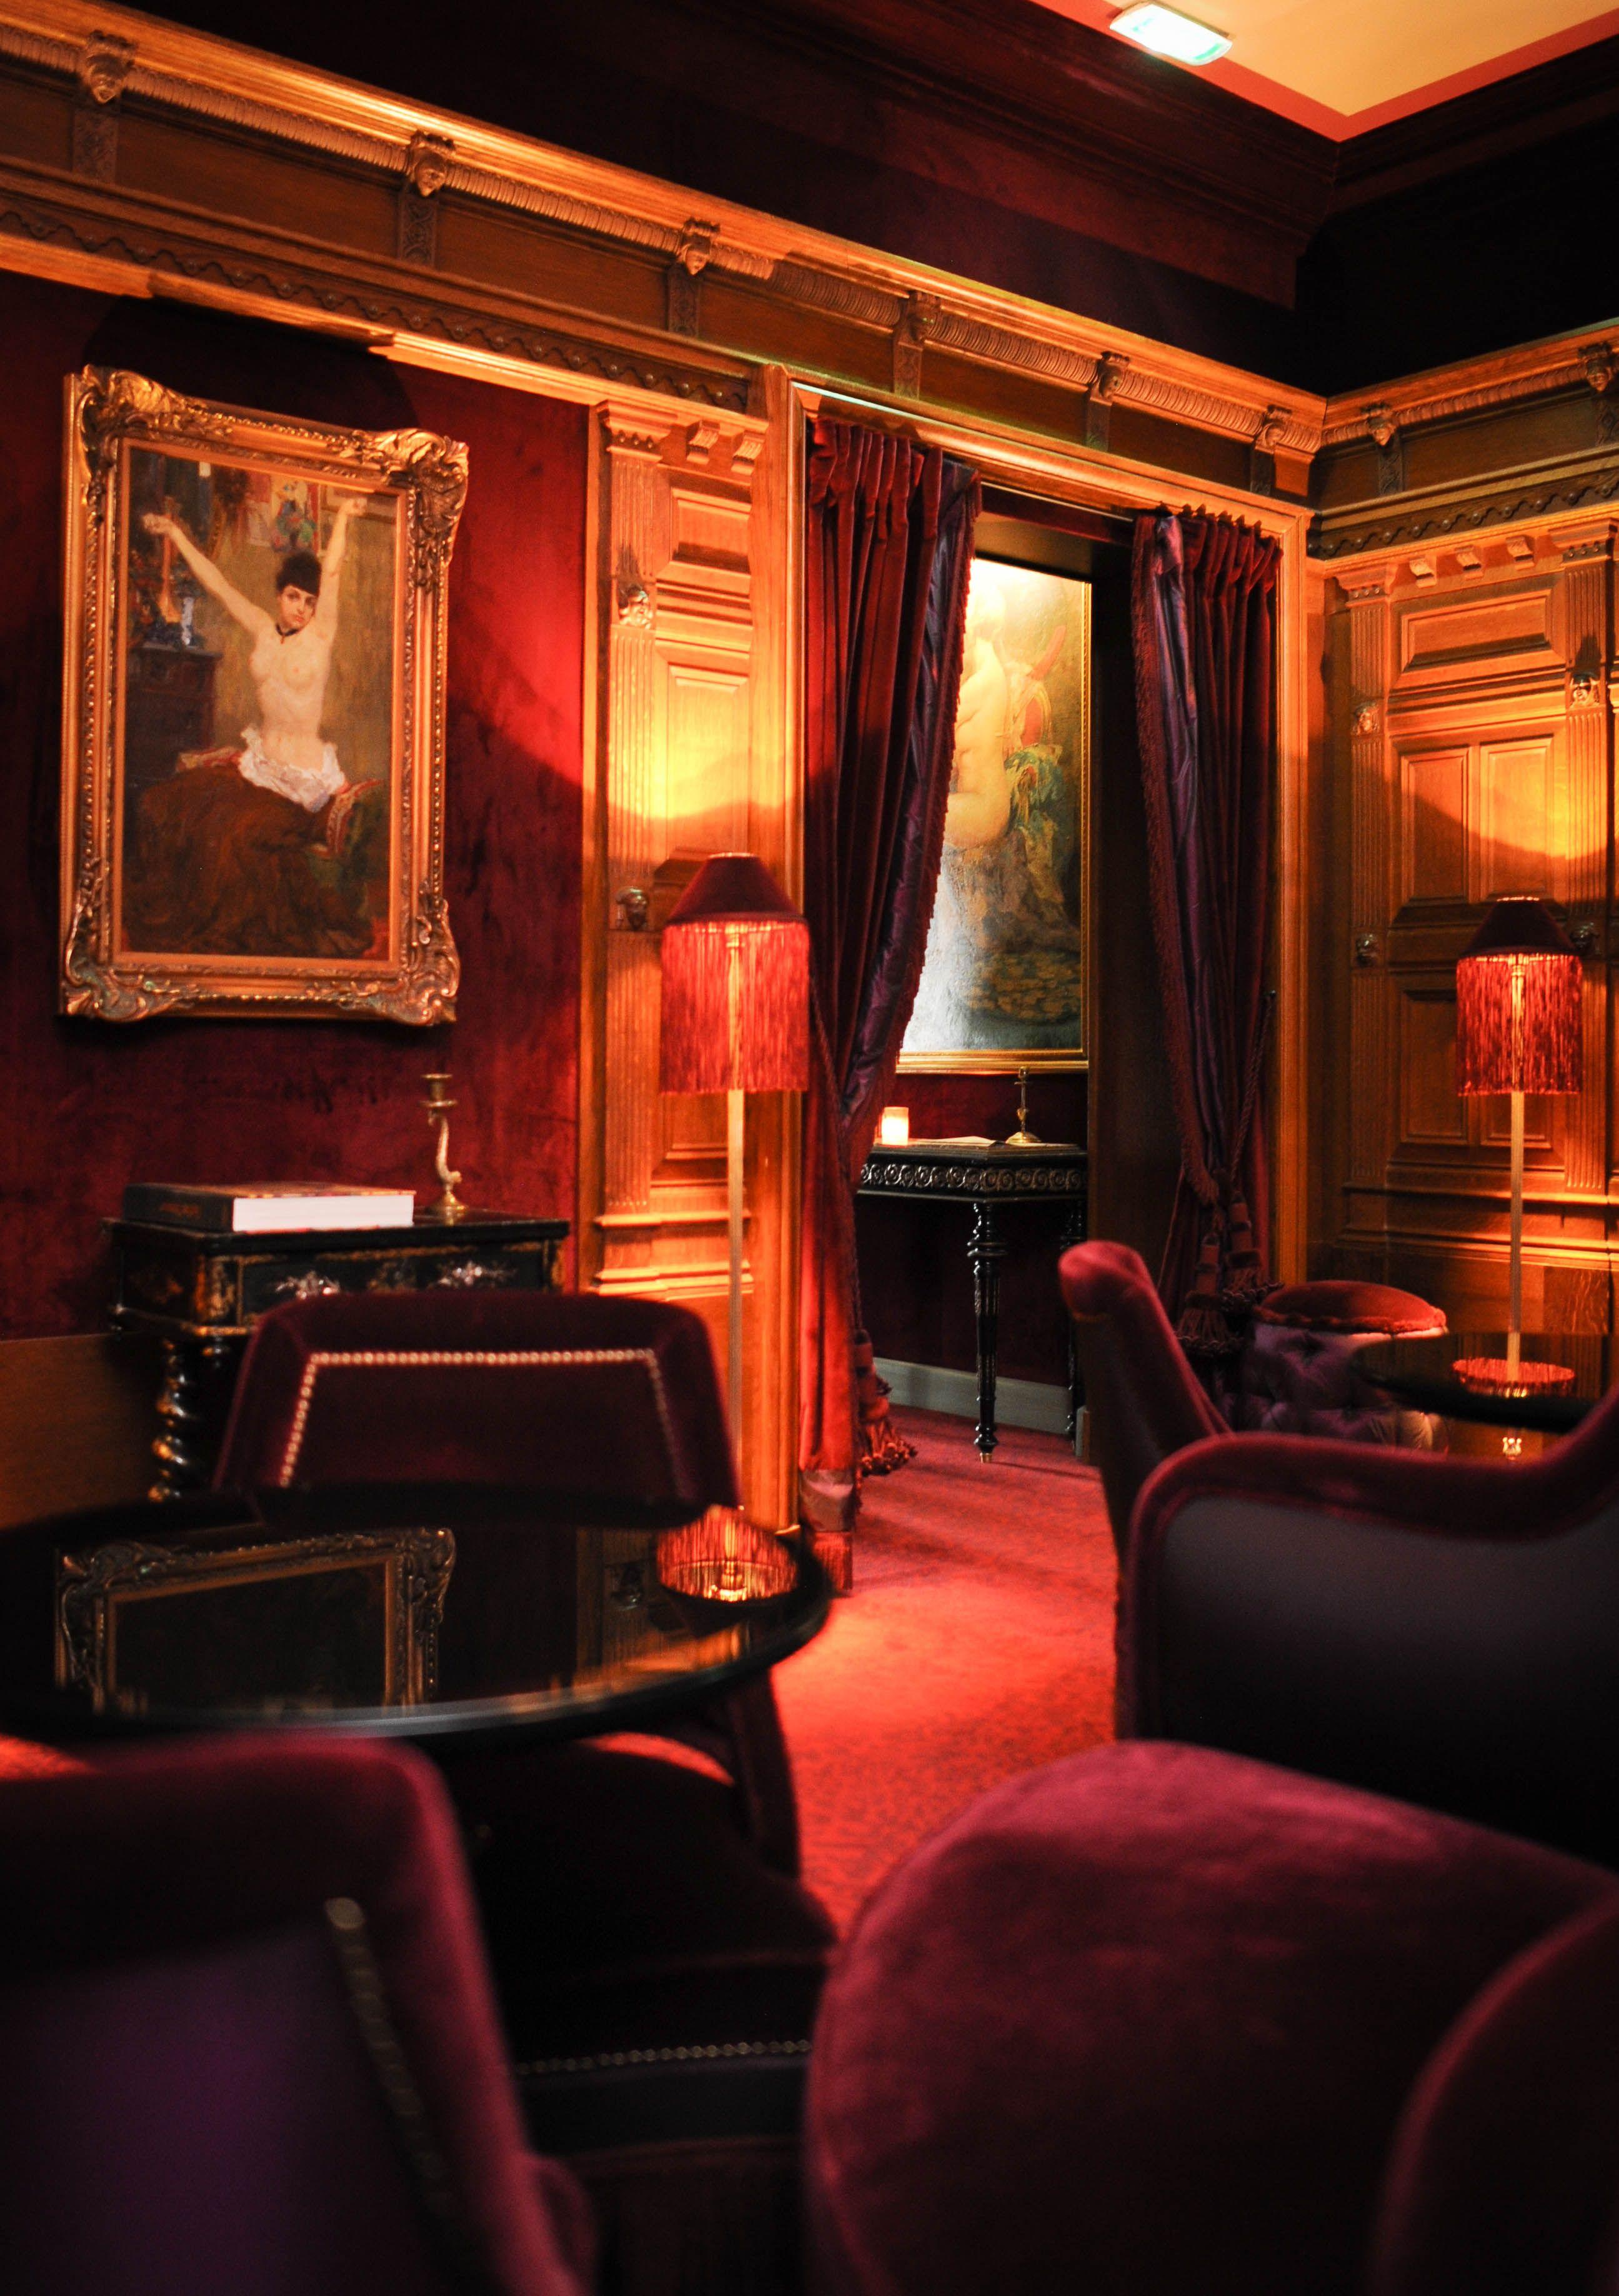 This lavish 20 room hotel is dark mysterious